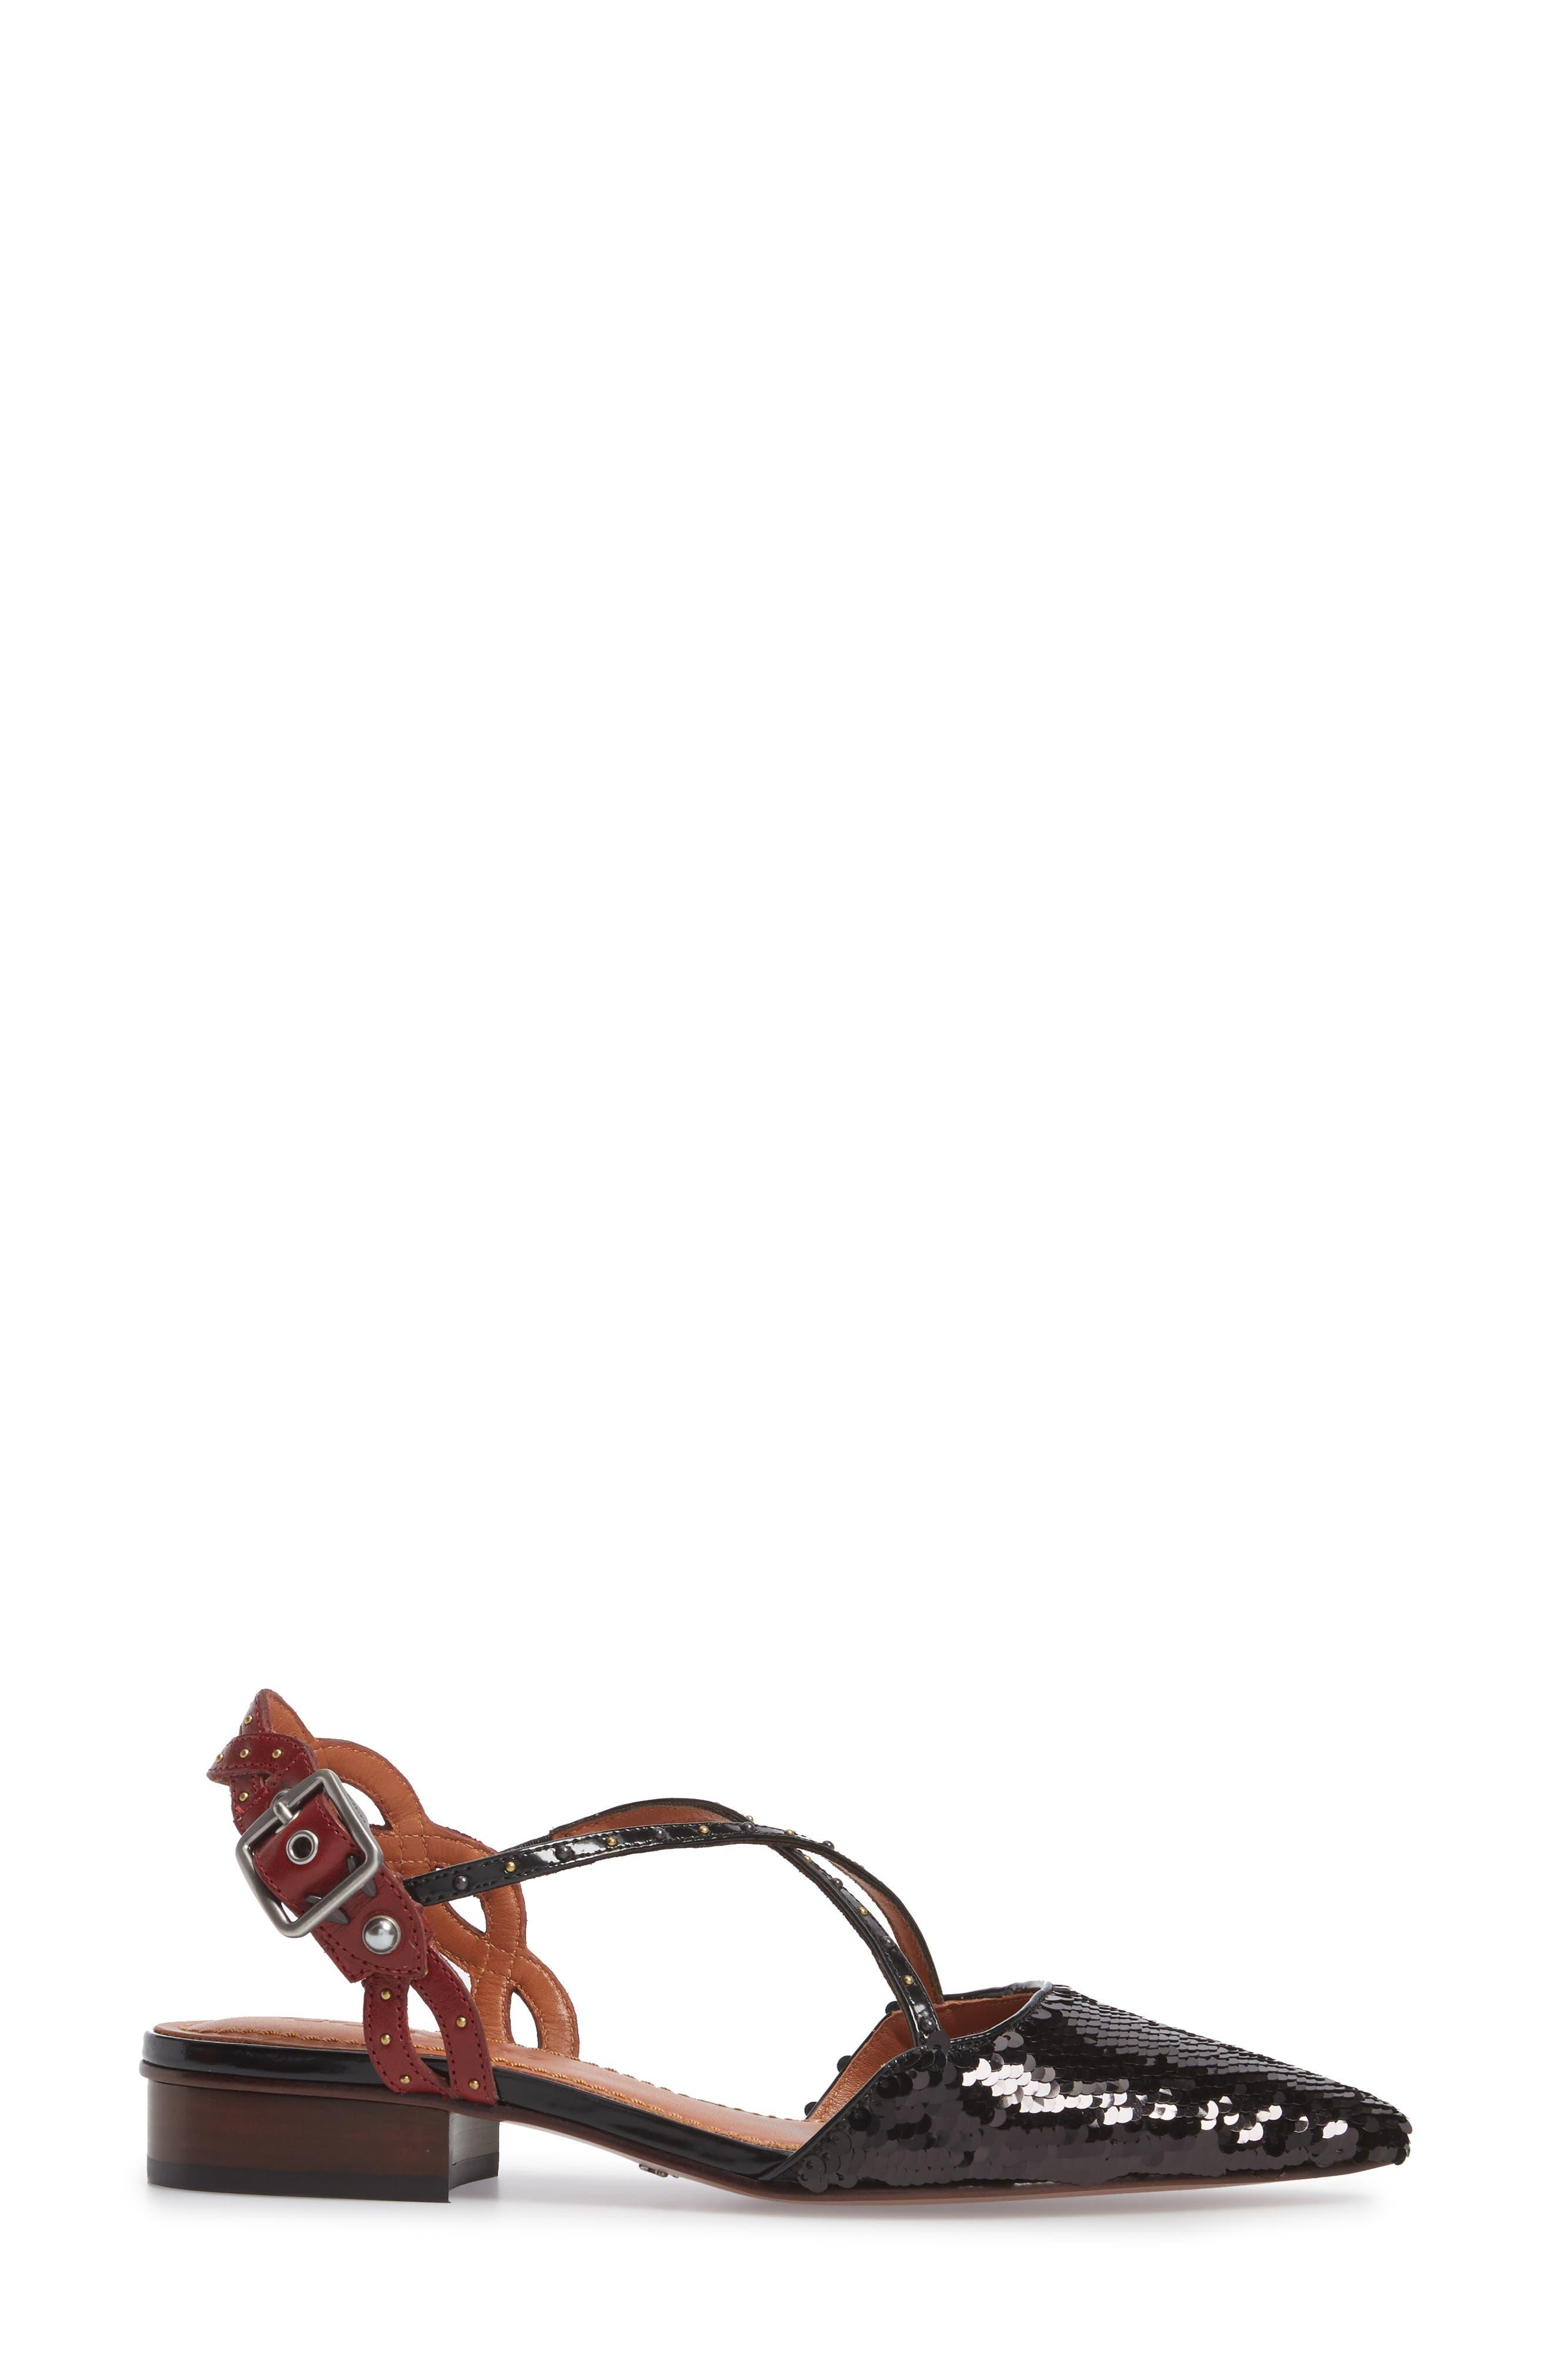 Sequin Slingback Flat,                             Alternate thumbnail 3, color,                             Black/ Wine Leather